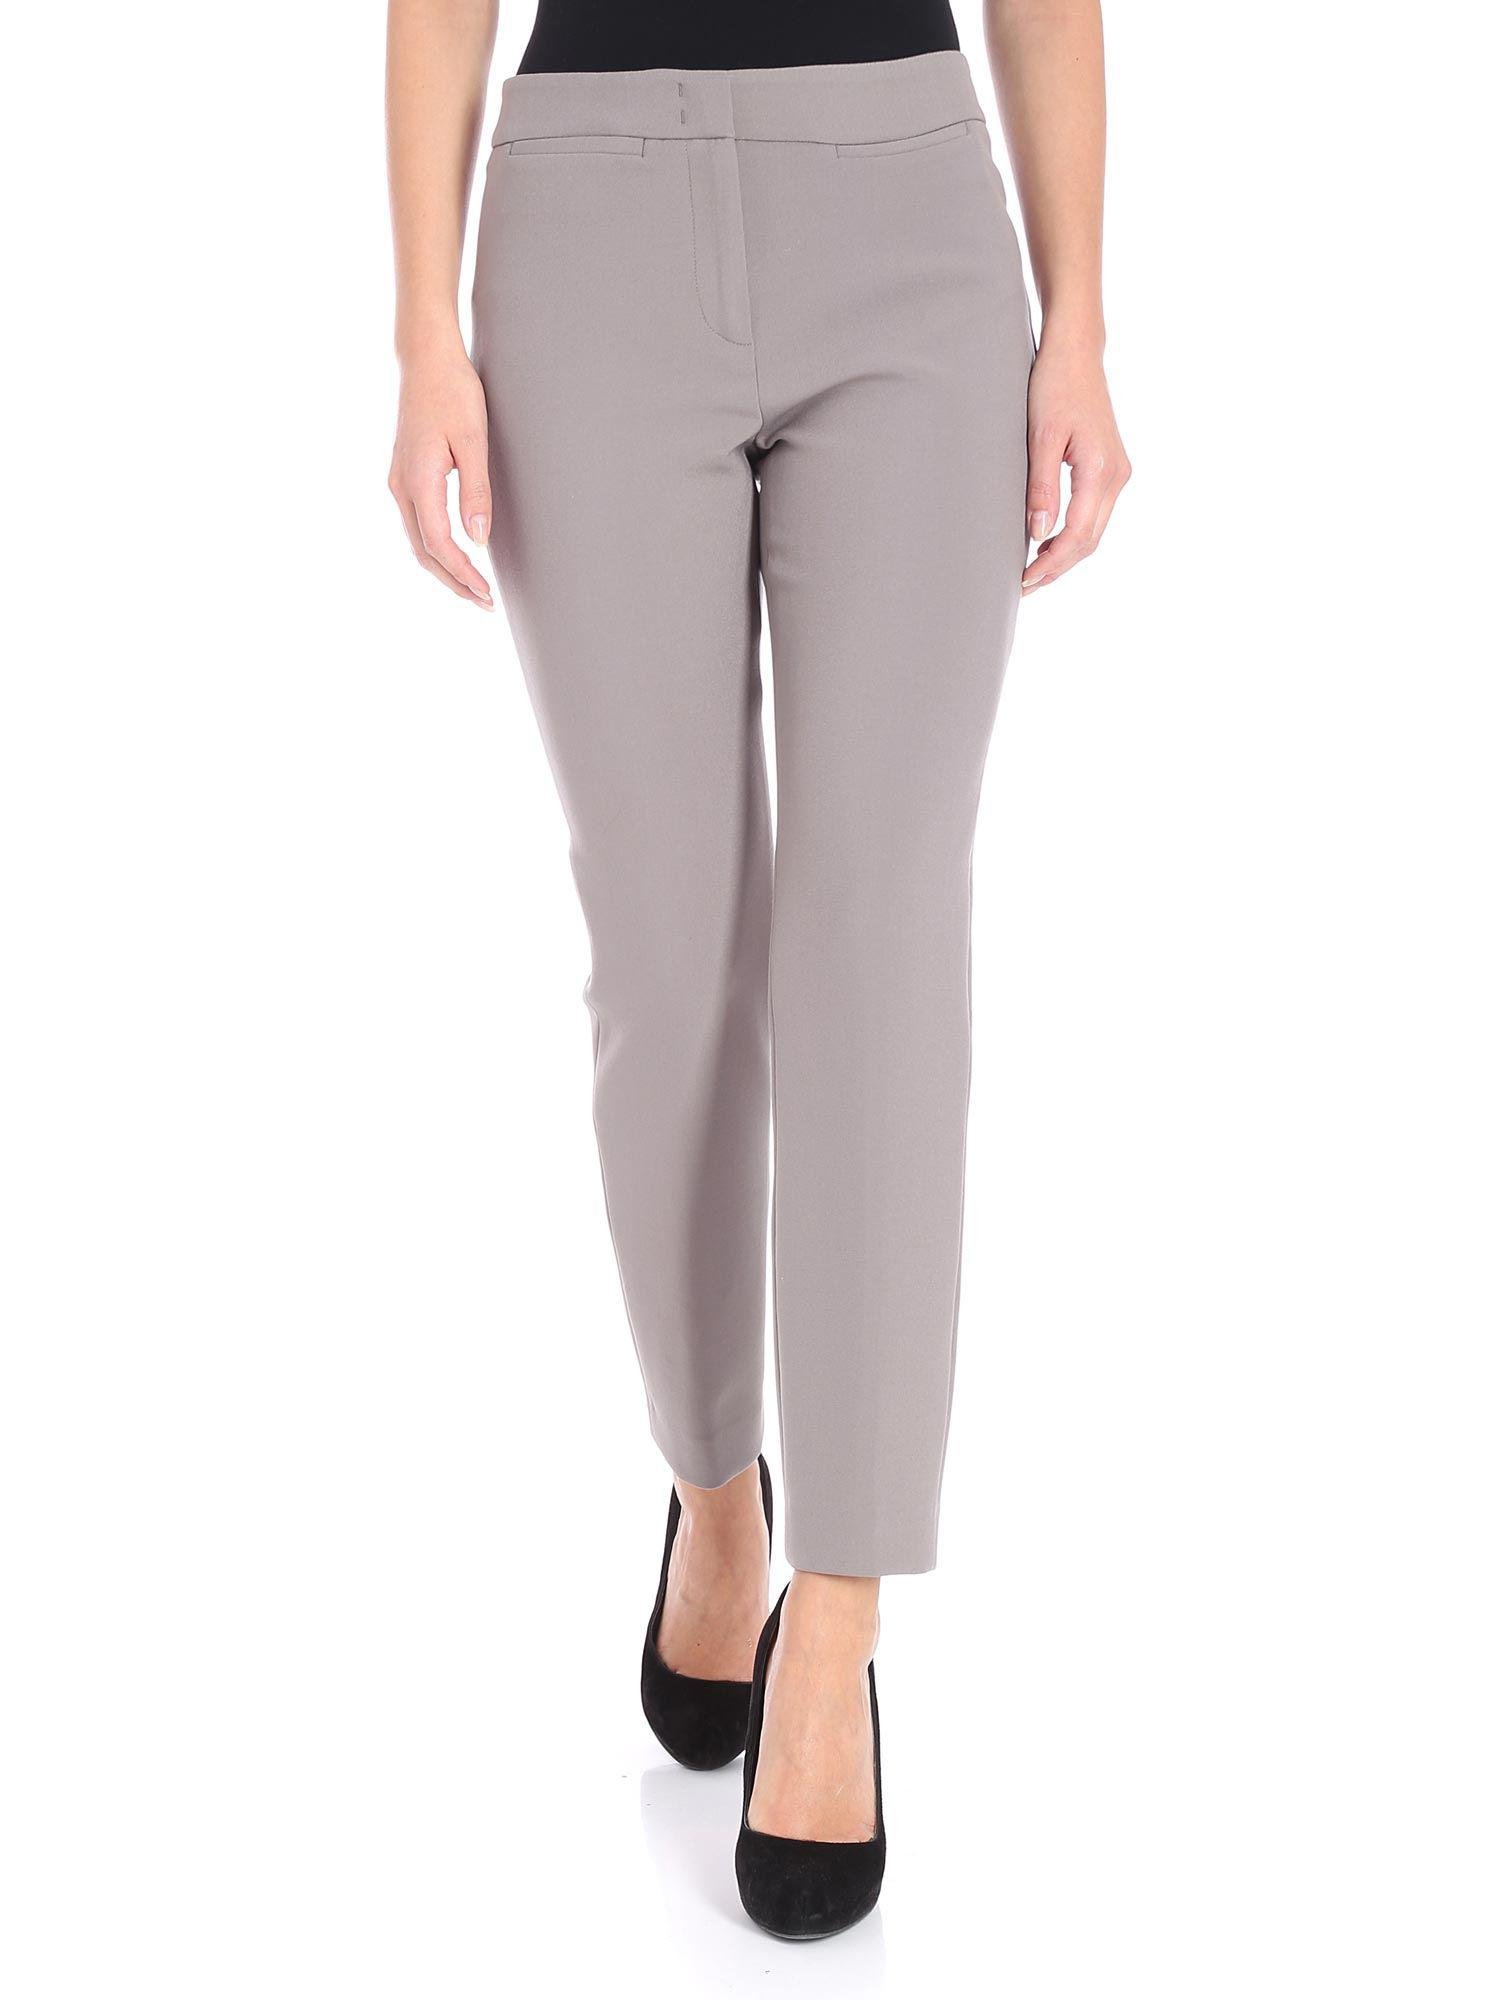 Fabric Lyst Peserico Taupe Milano Trousers OZkiPXu